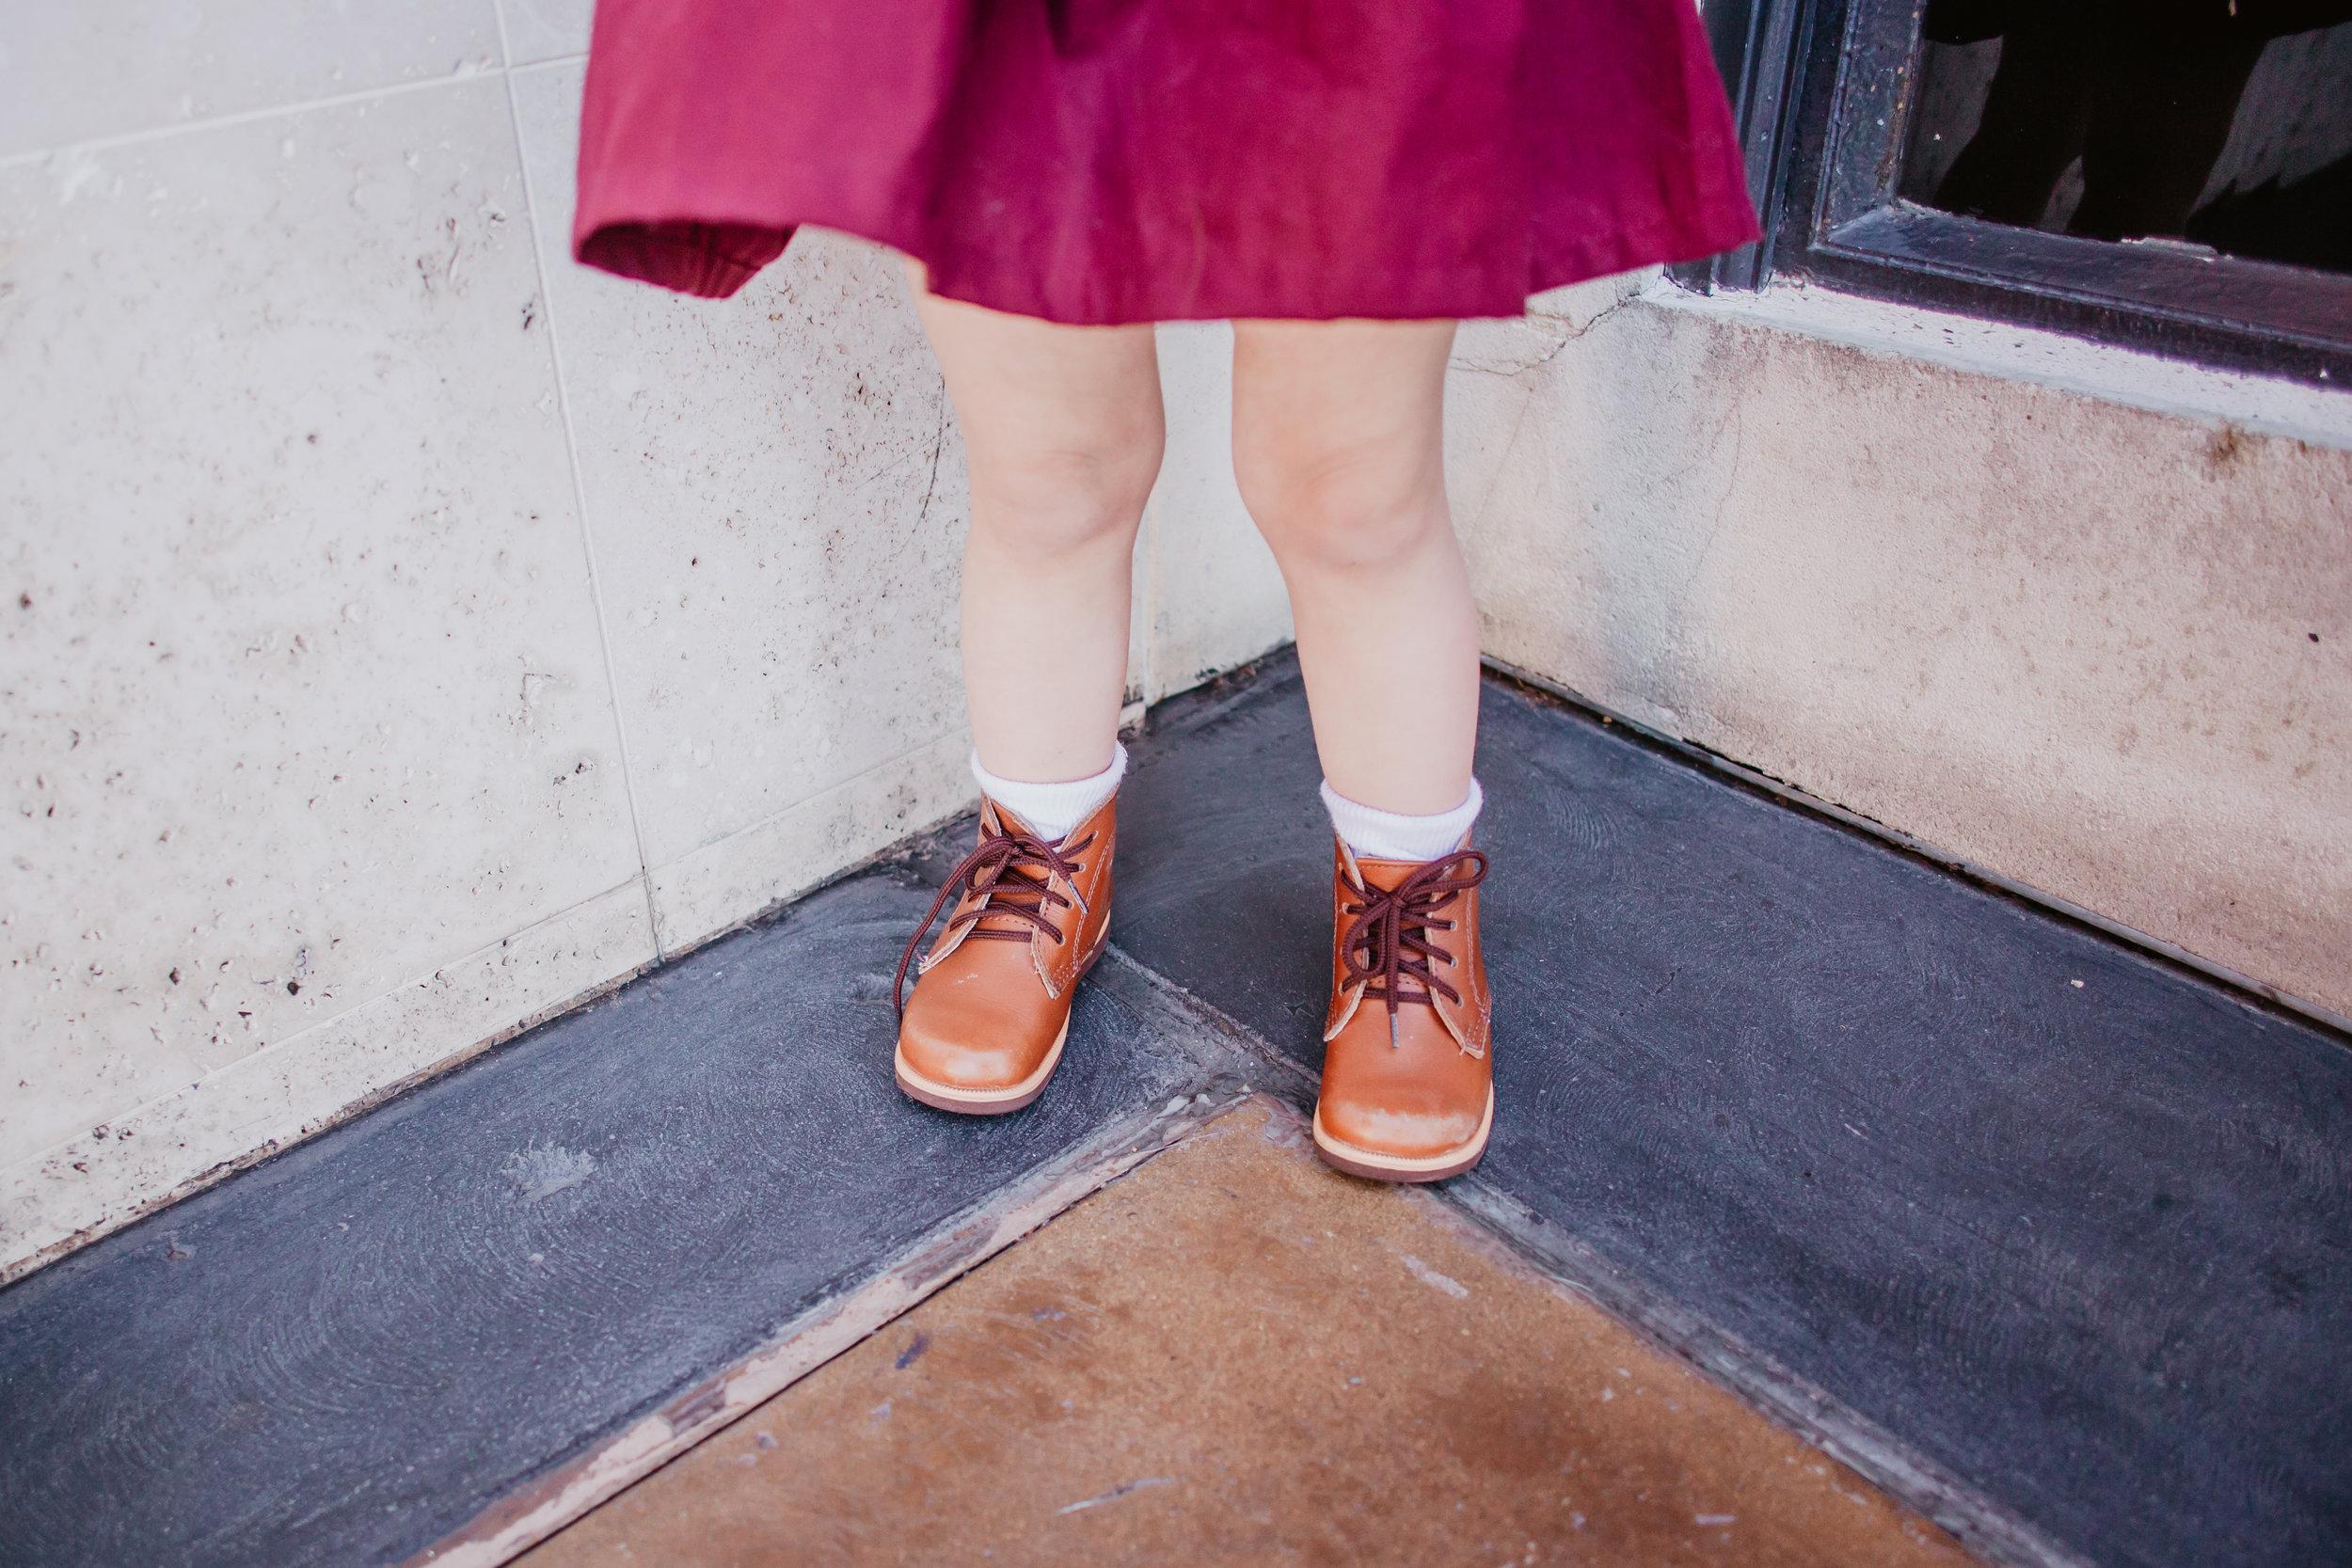 Kids Suspender Skirt - Black Women's Overalls - Cute Kids Clothes -- Mommy Blogger - The Overwhelmed Mommy